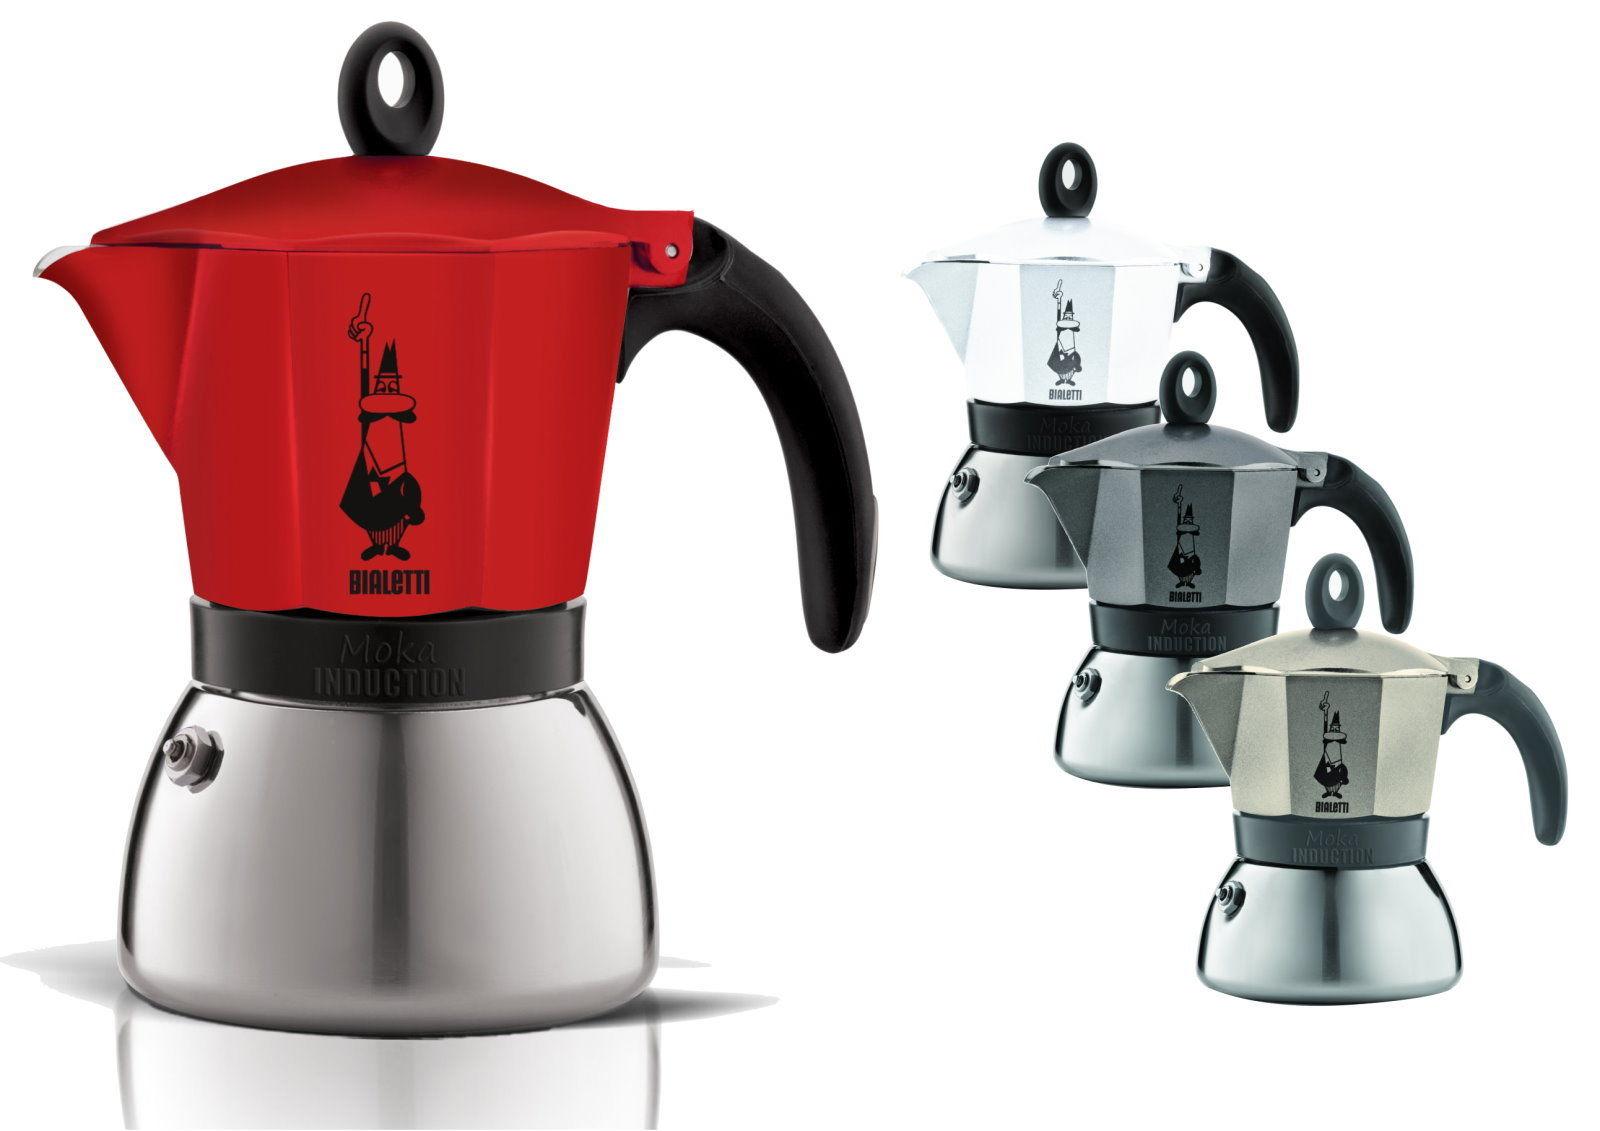 bialetti induktion espressokocher 6 tassen moka espresso. Black Bedroom Furniture Sets. Home Design Ideas